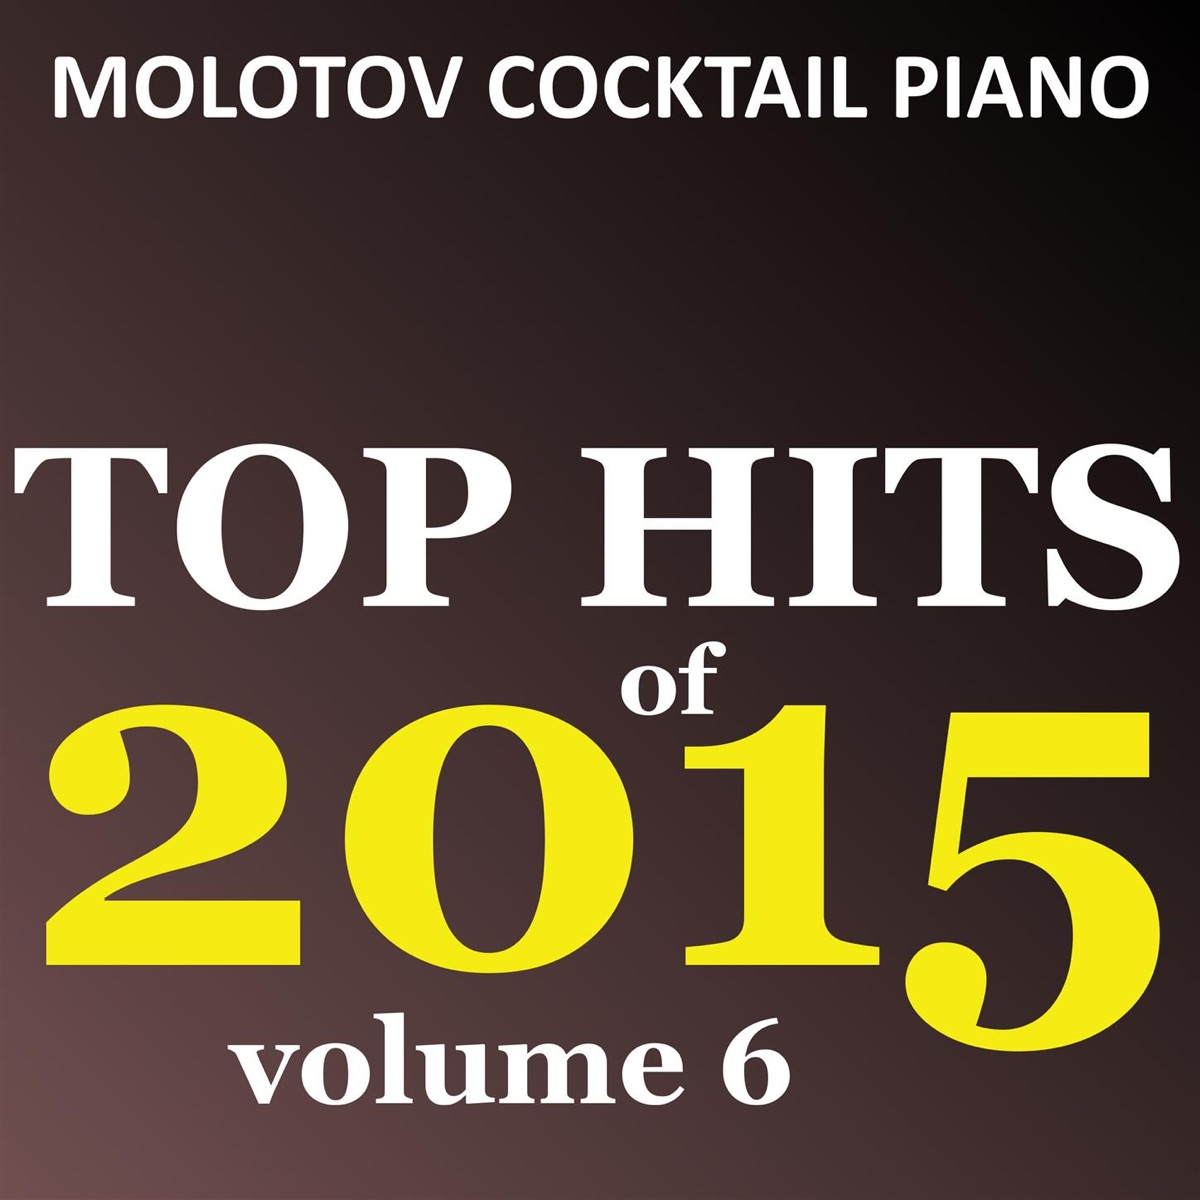 MCP Top Hits of 2015 Vol 6 Molotov Cocktail Piano CD cover